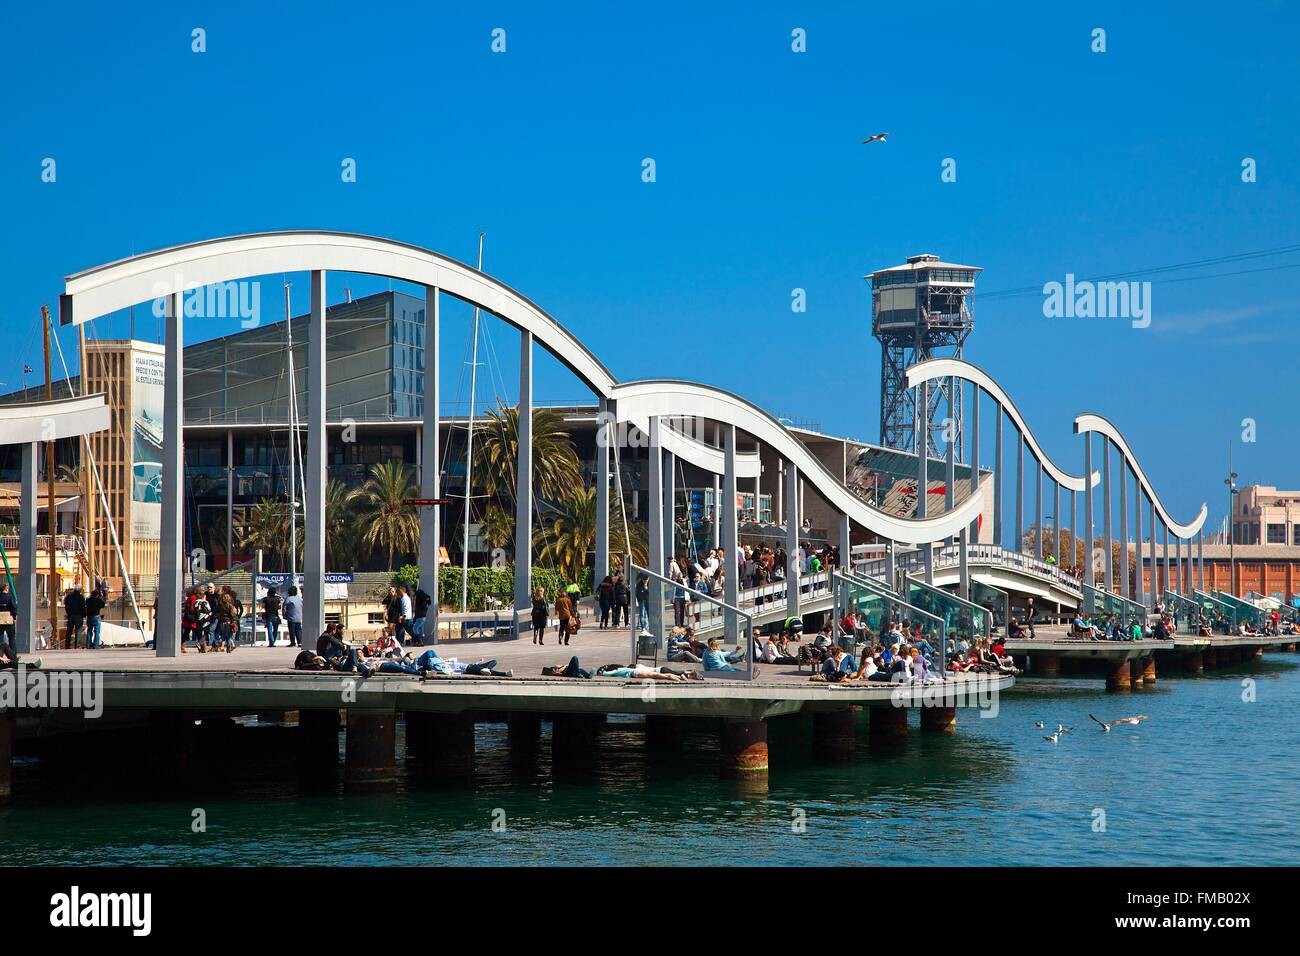 Spain, Catalonia, Barcelona, Rambla del Mar Footbridges by architects Helio Pinon and Albert Viaplana near Port - Stock Image